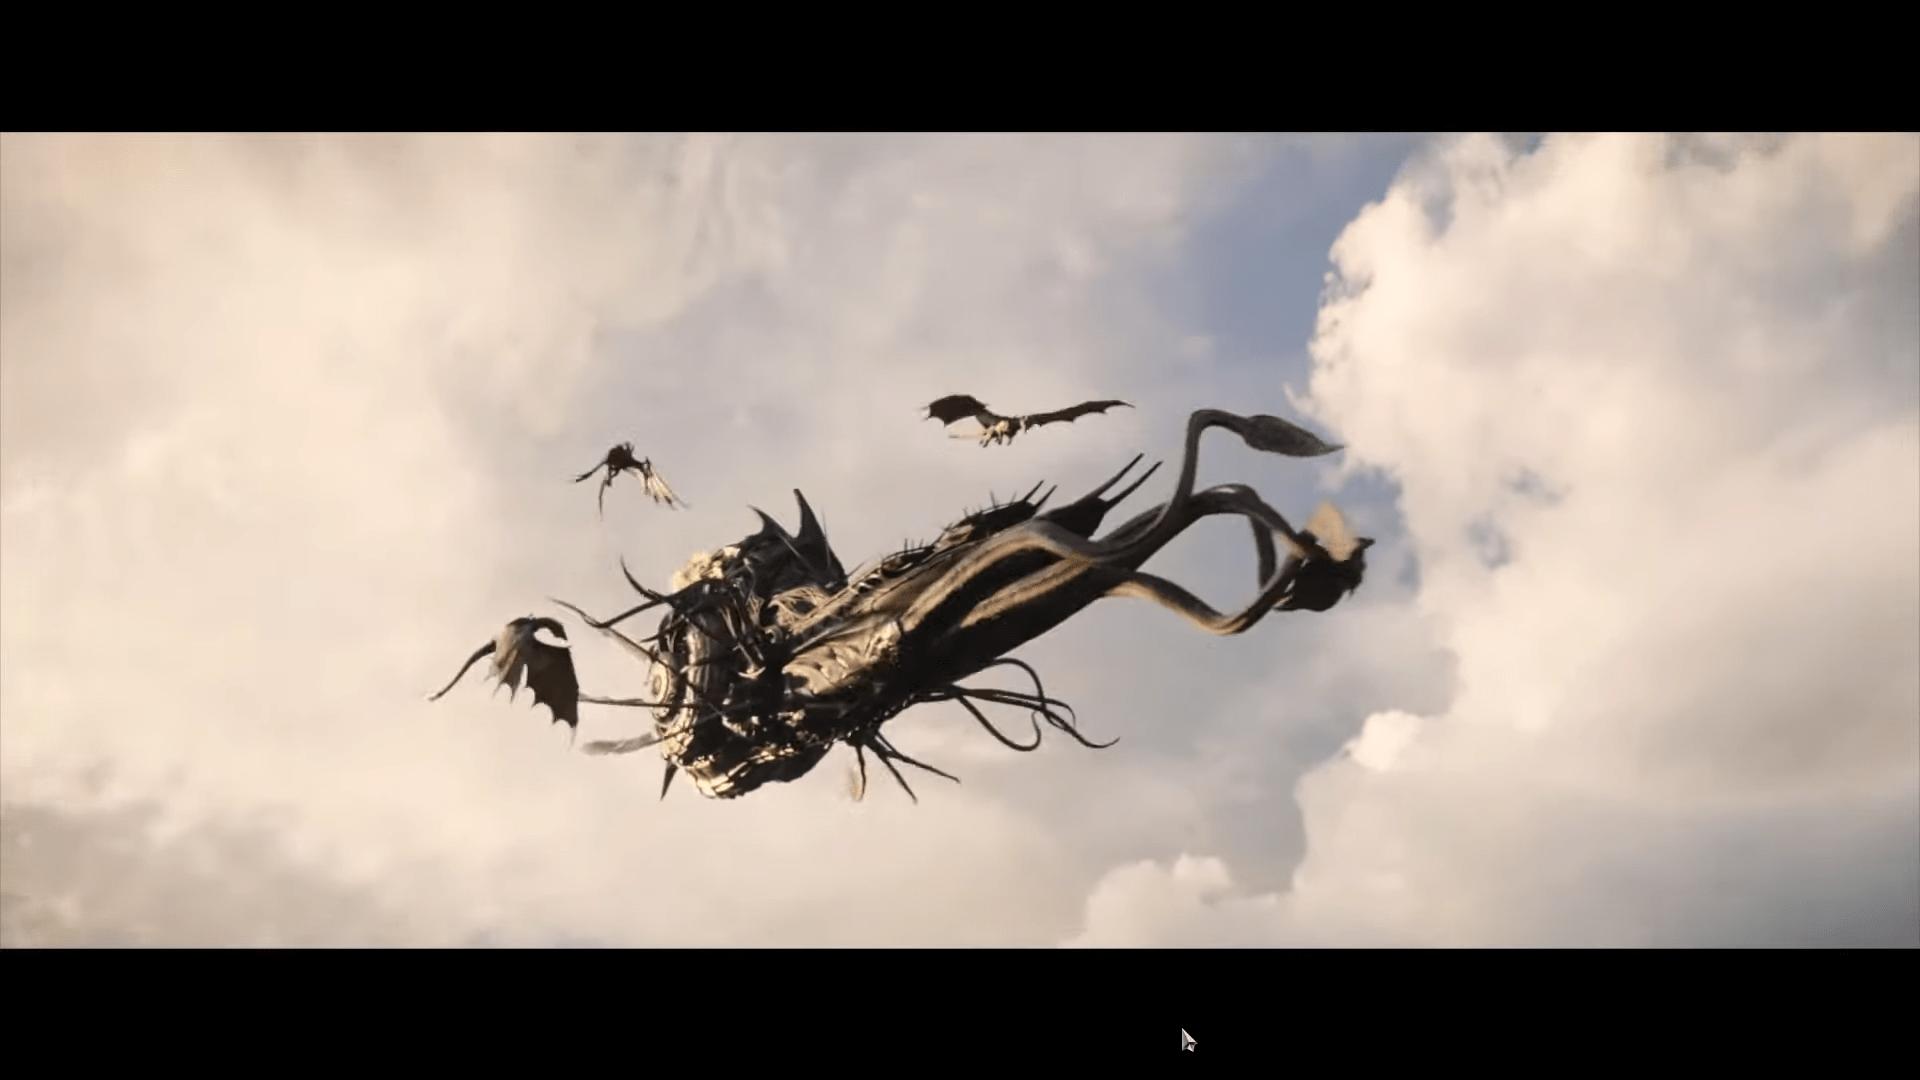 Baldur's Gate 3 Images Get Leaked Ahead Of Schedule, The Trailer Arrives Twelve Hours Later